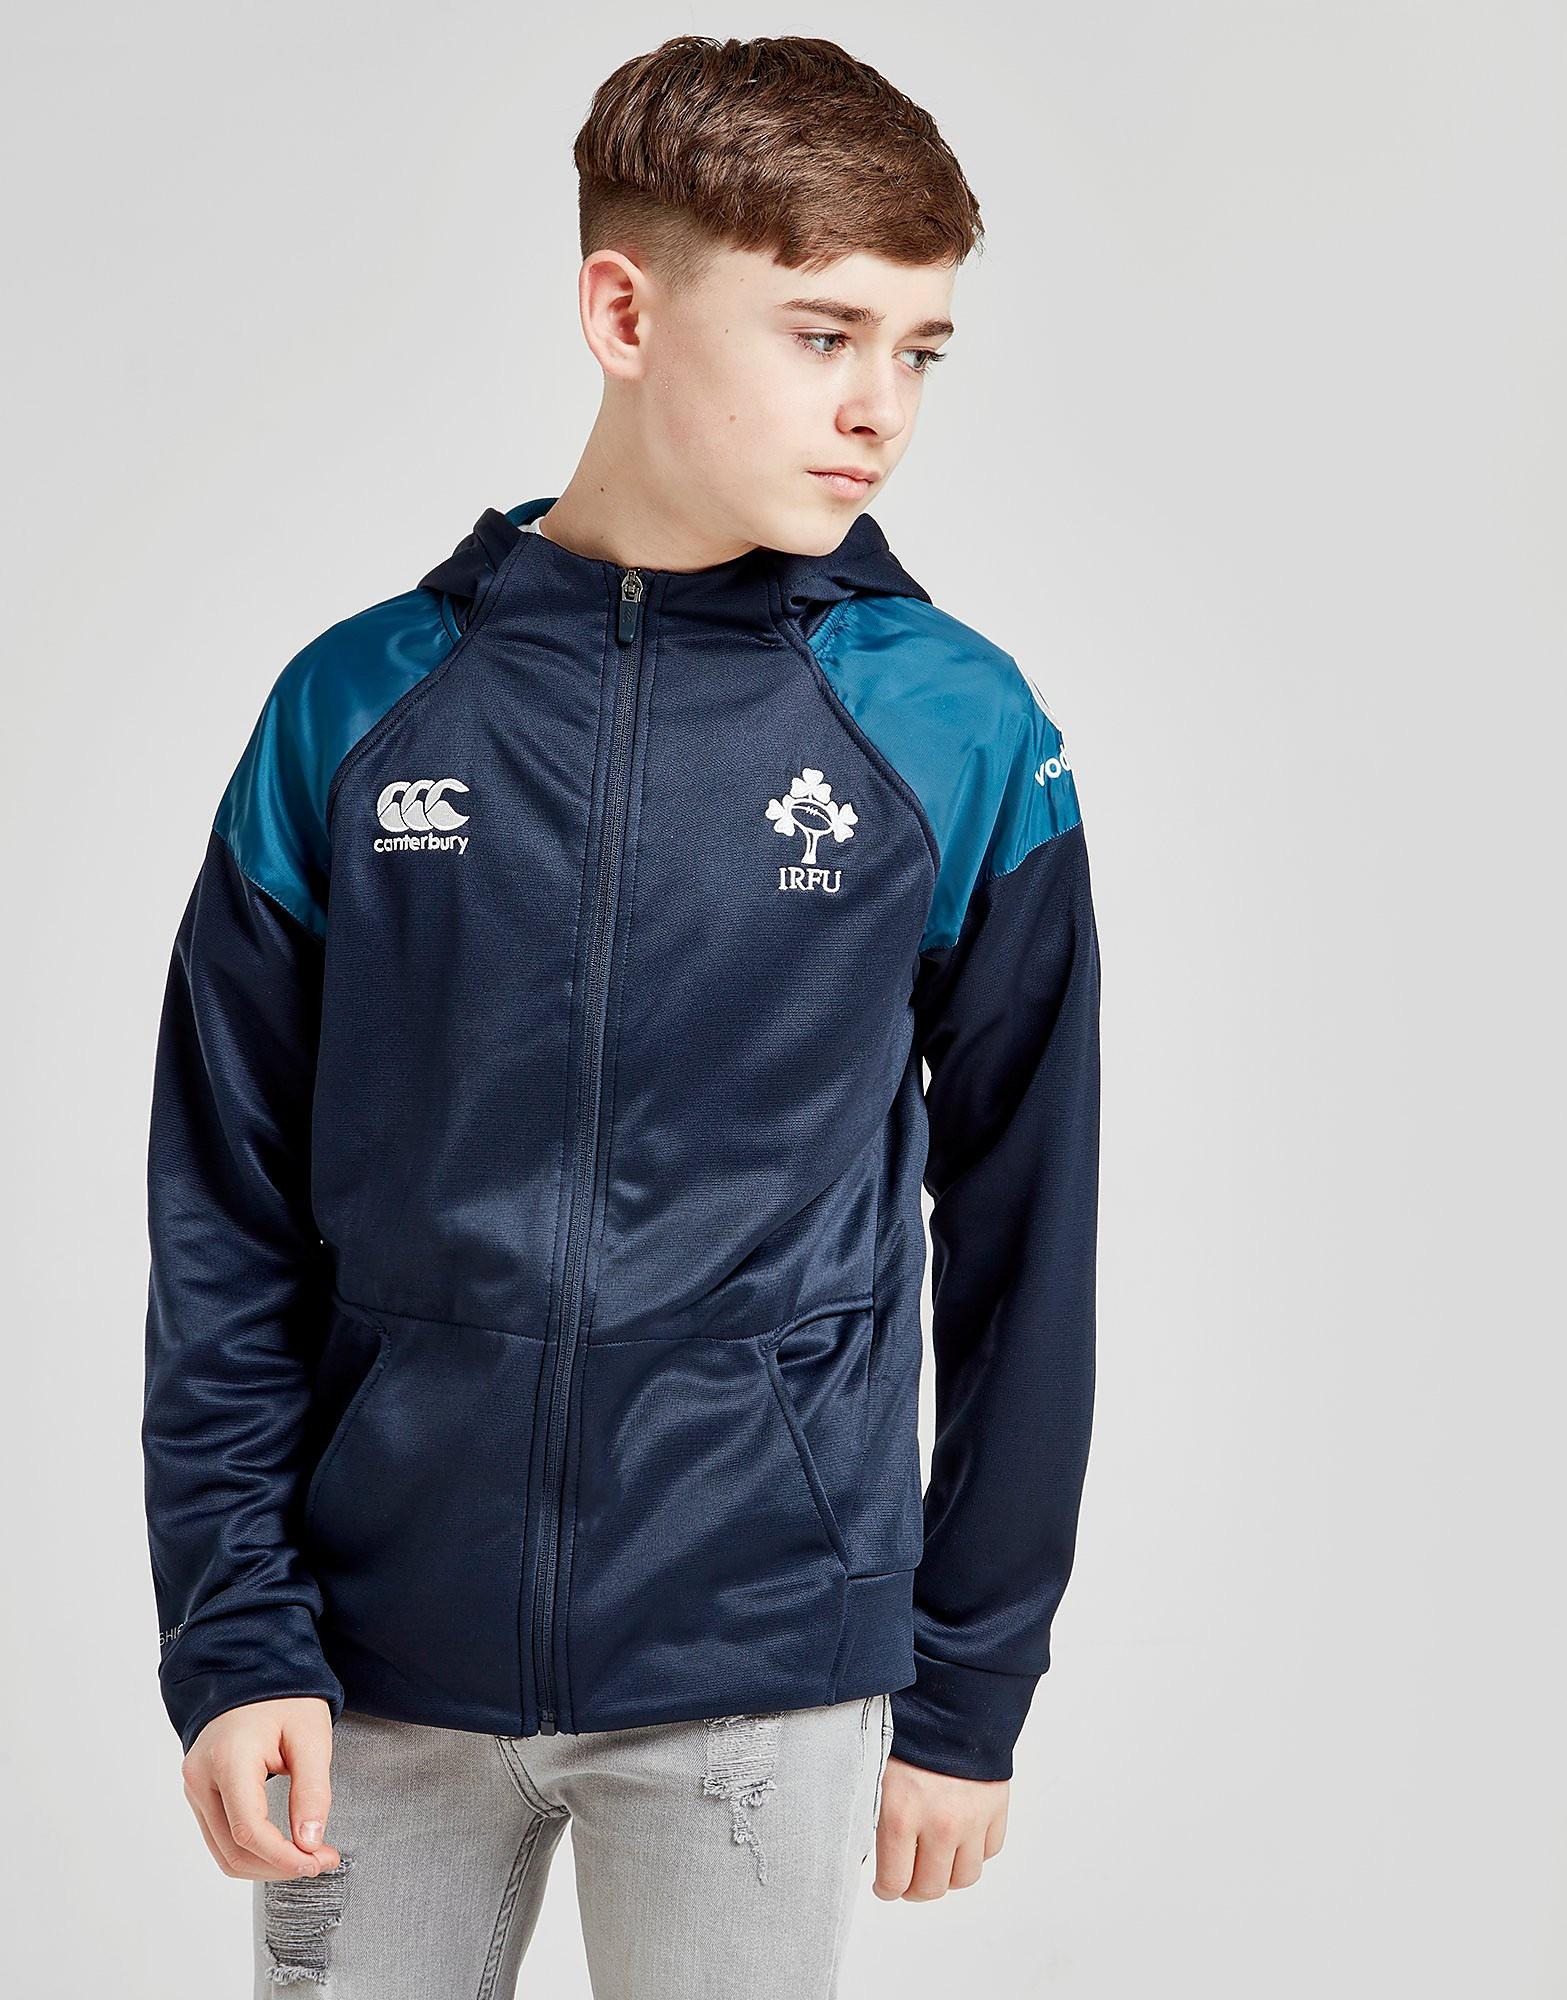 Canterbury Ireland RFU Hybrid Full Zip Hoodie Junior - Blauw - Kind